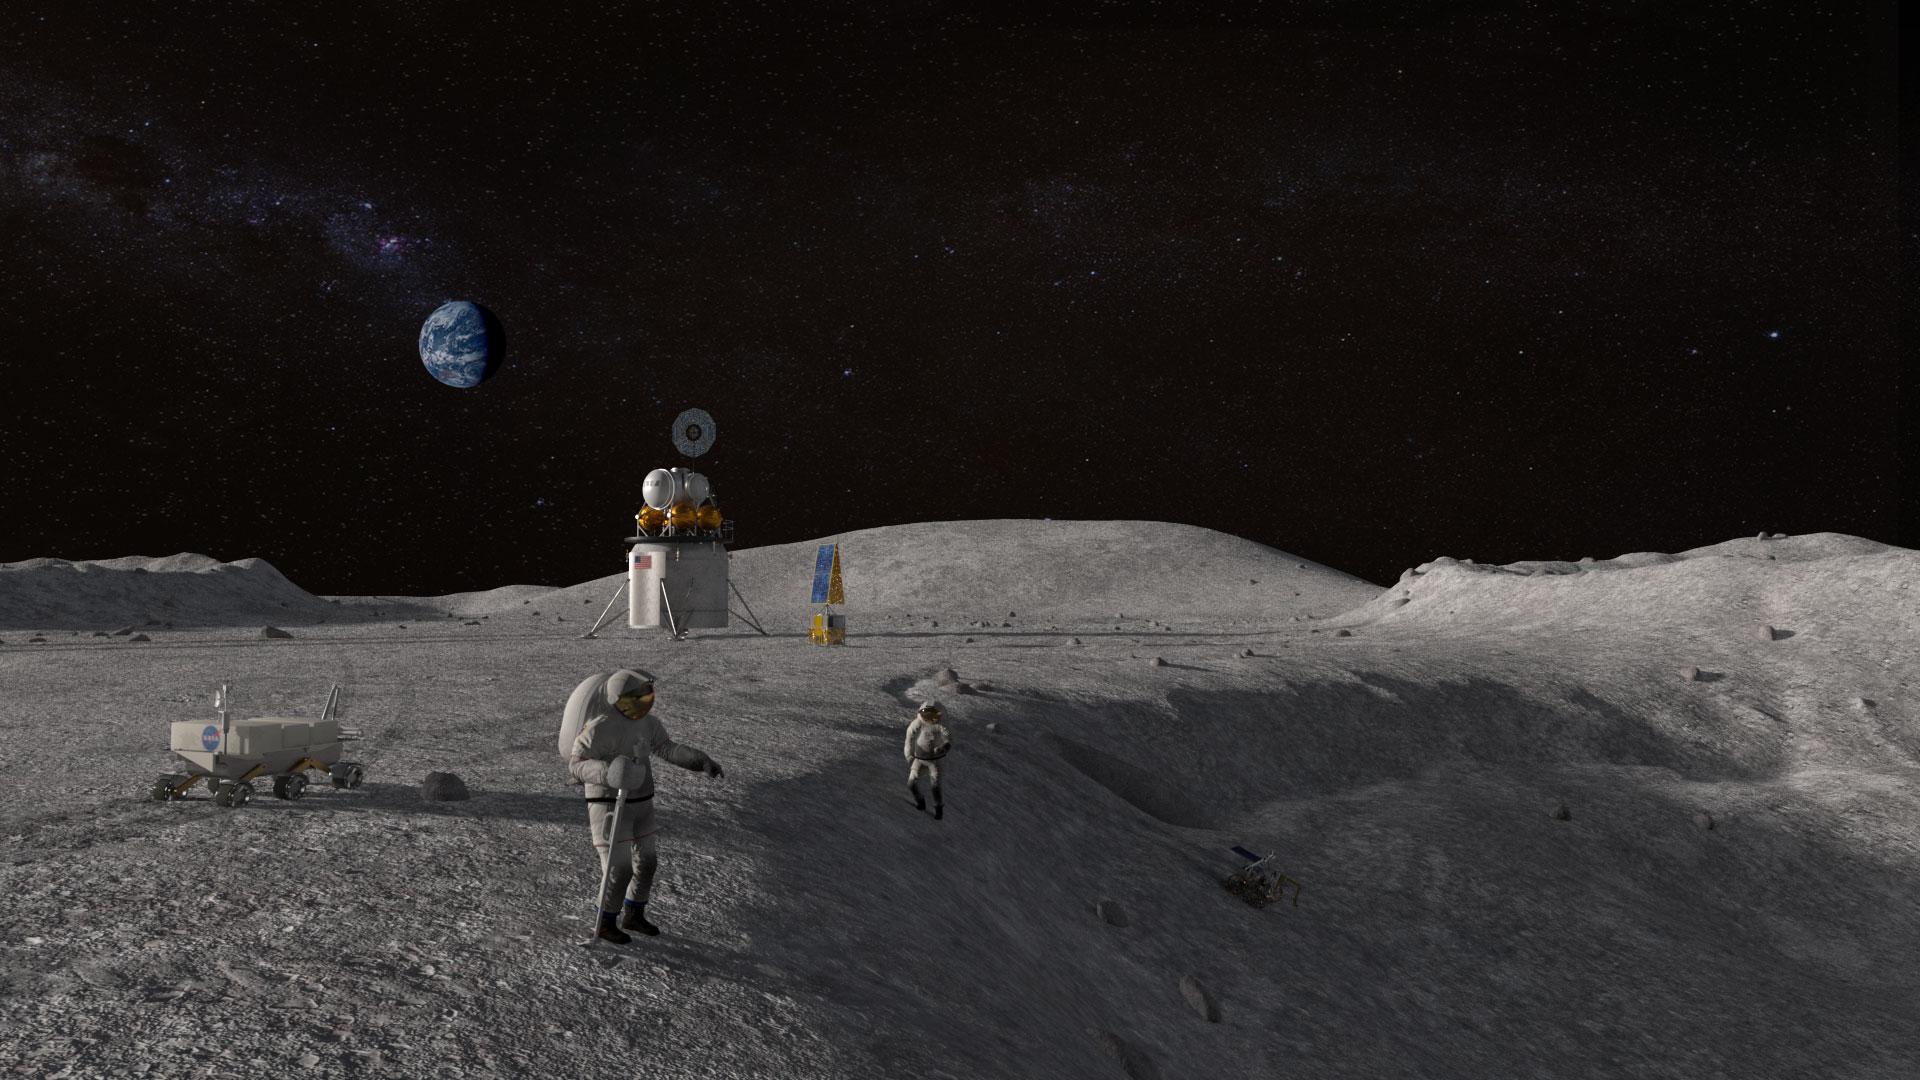 gp_astronauts_lunar_craterv2.jpg